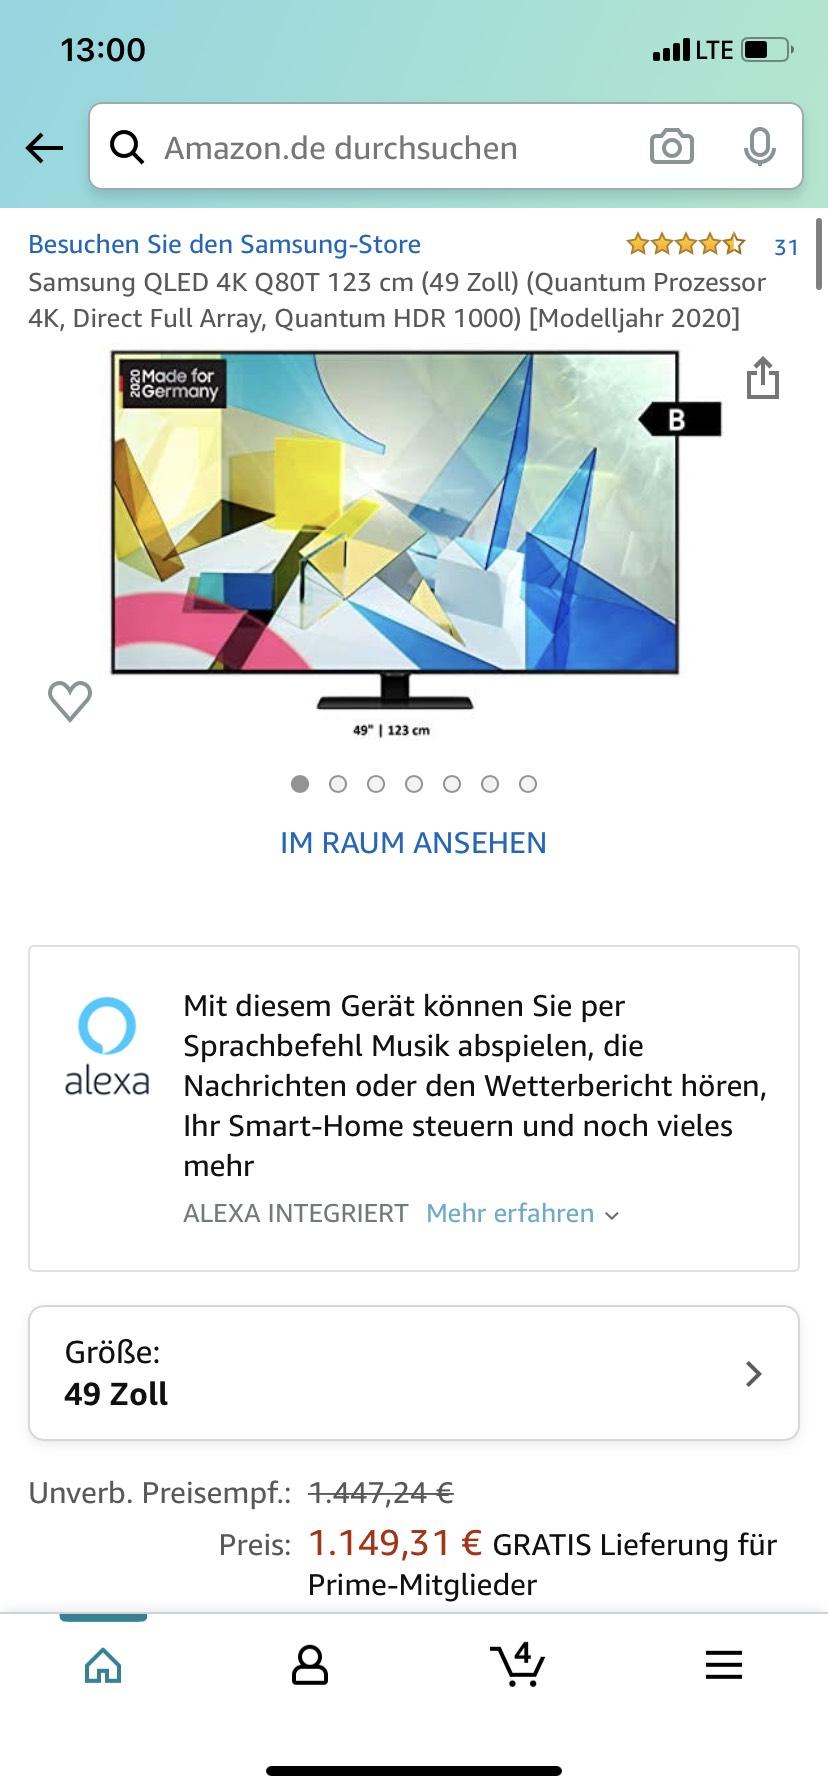 Samsung QLED 4K 49 Zoll